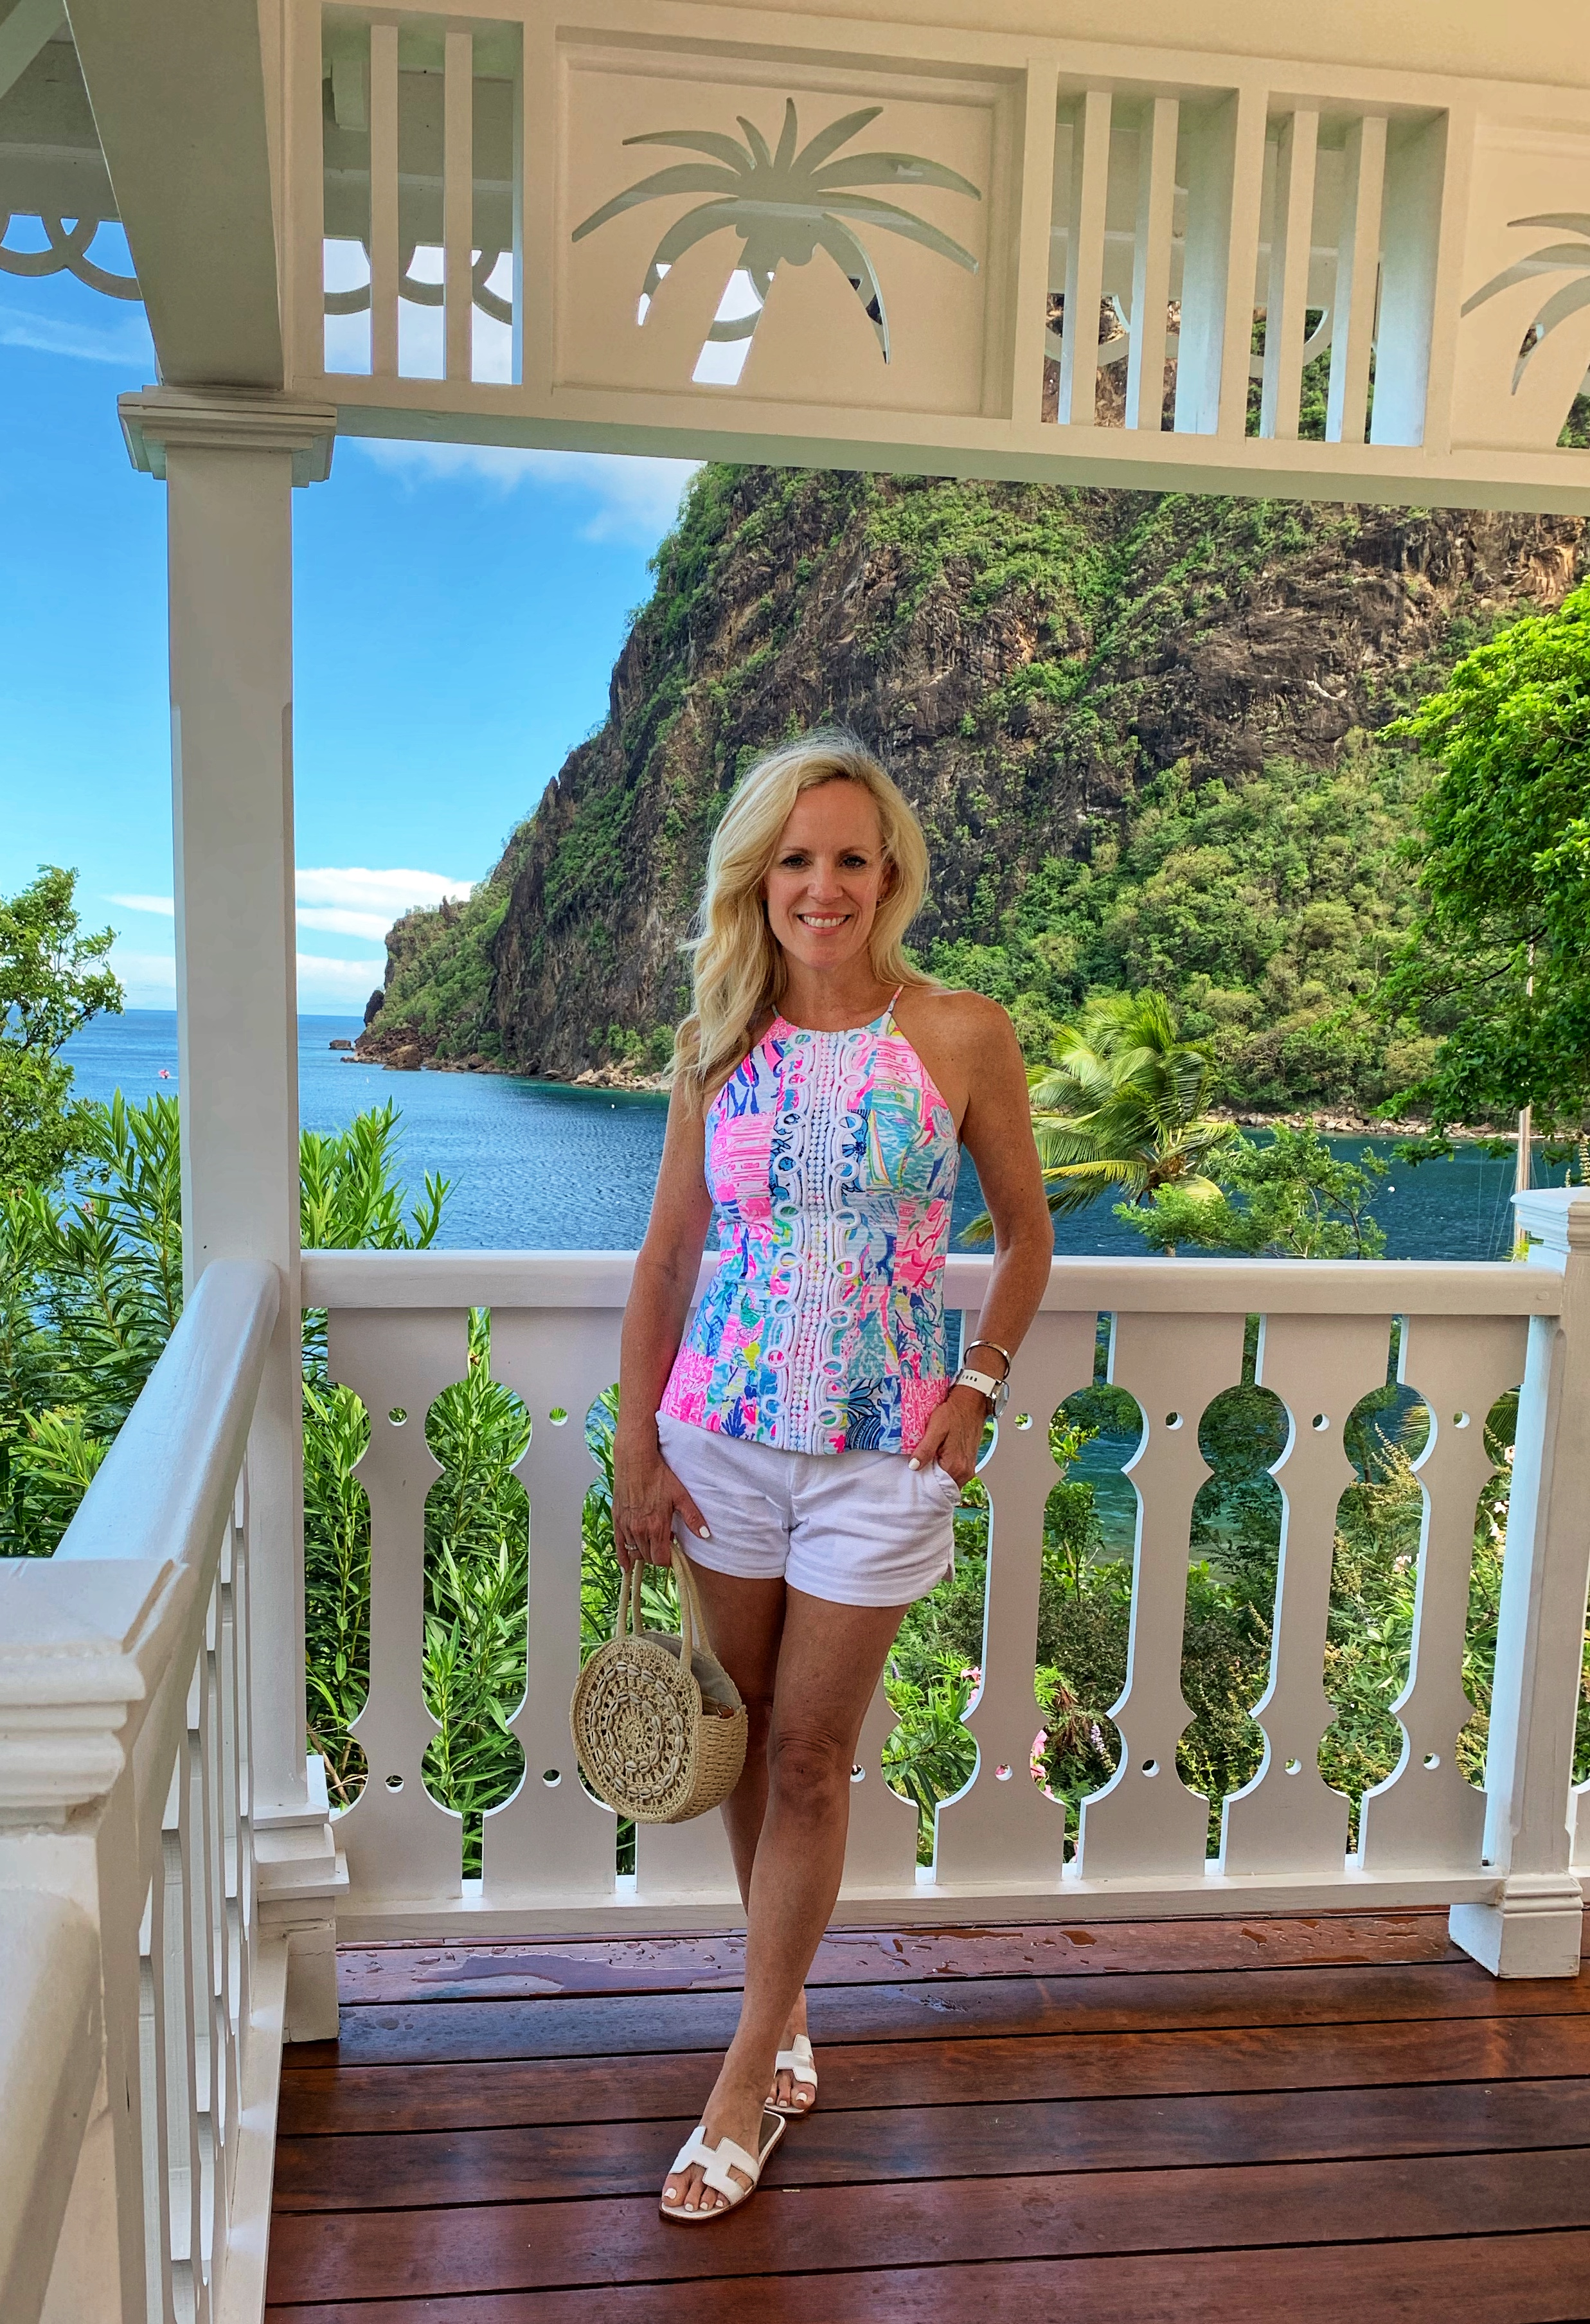 Lilly Pulitzer Patchwork Top, St. Lucia, Sugar Beach, Viceroy Sugar Beach, Alicia Wood, Dallas Travel Blogger